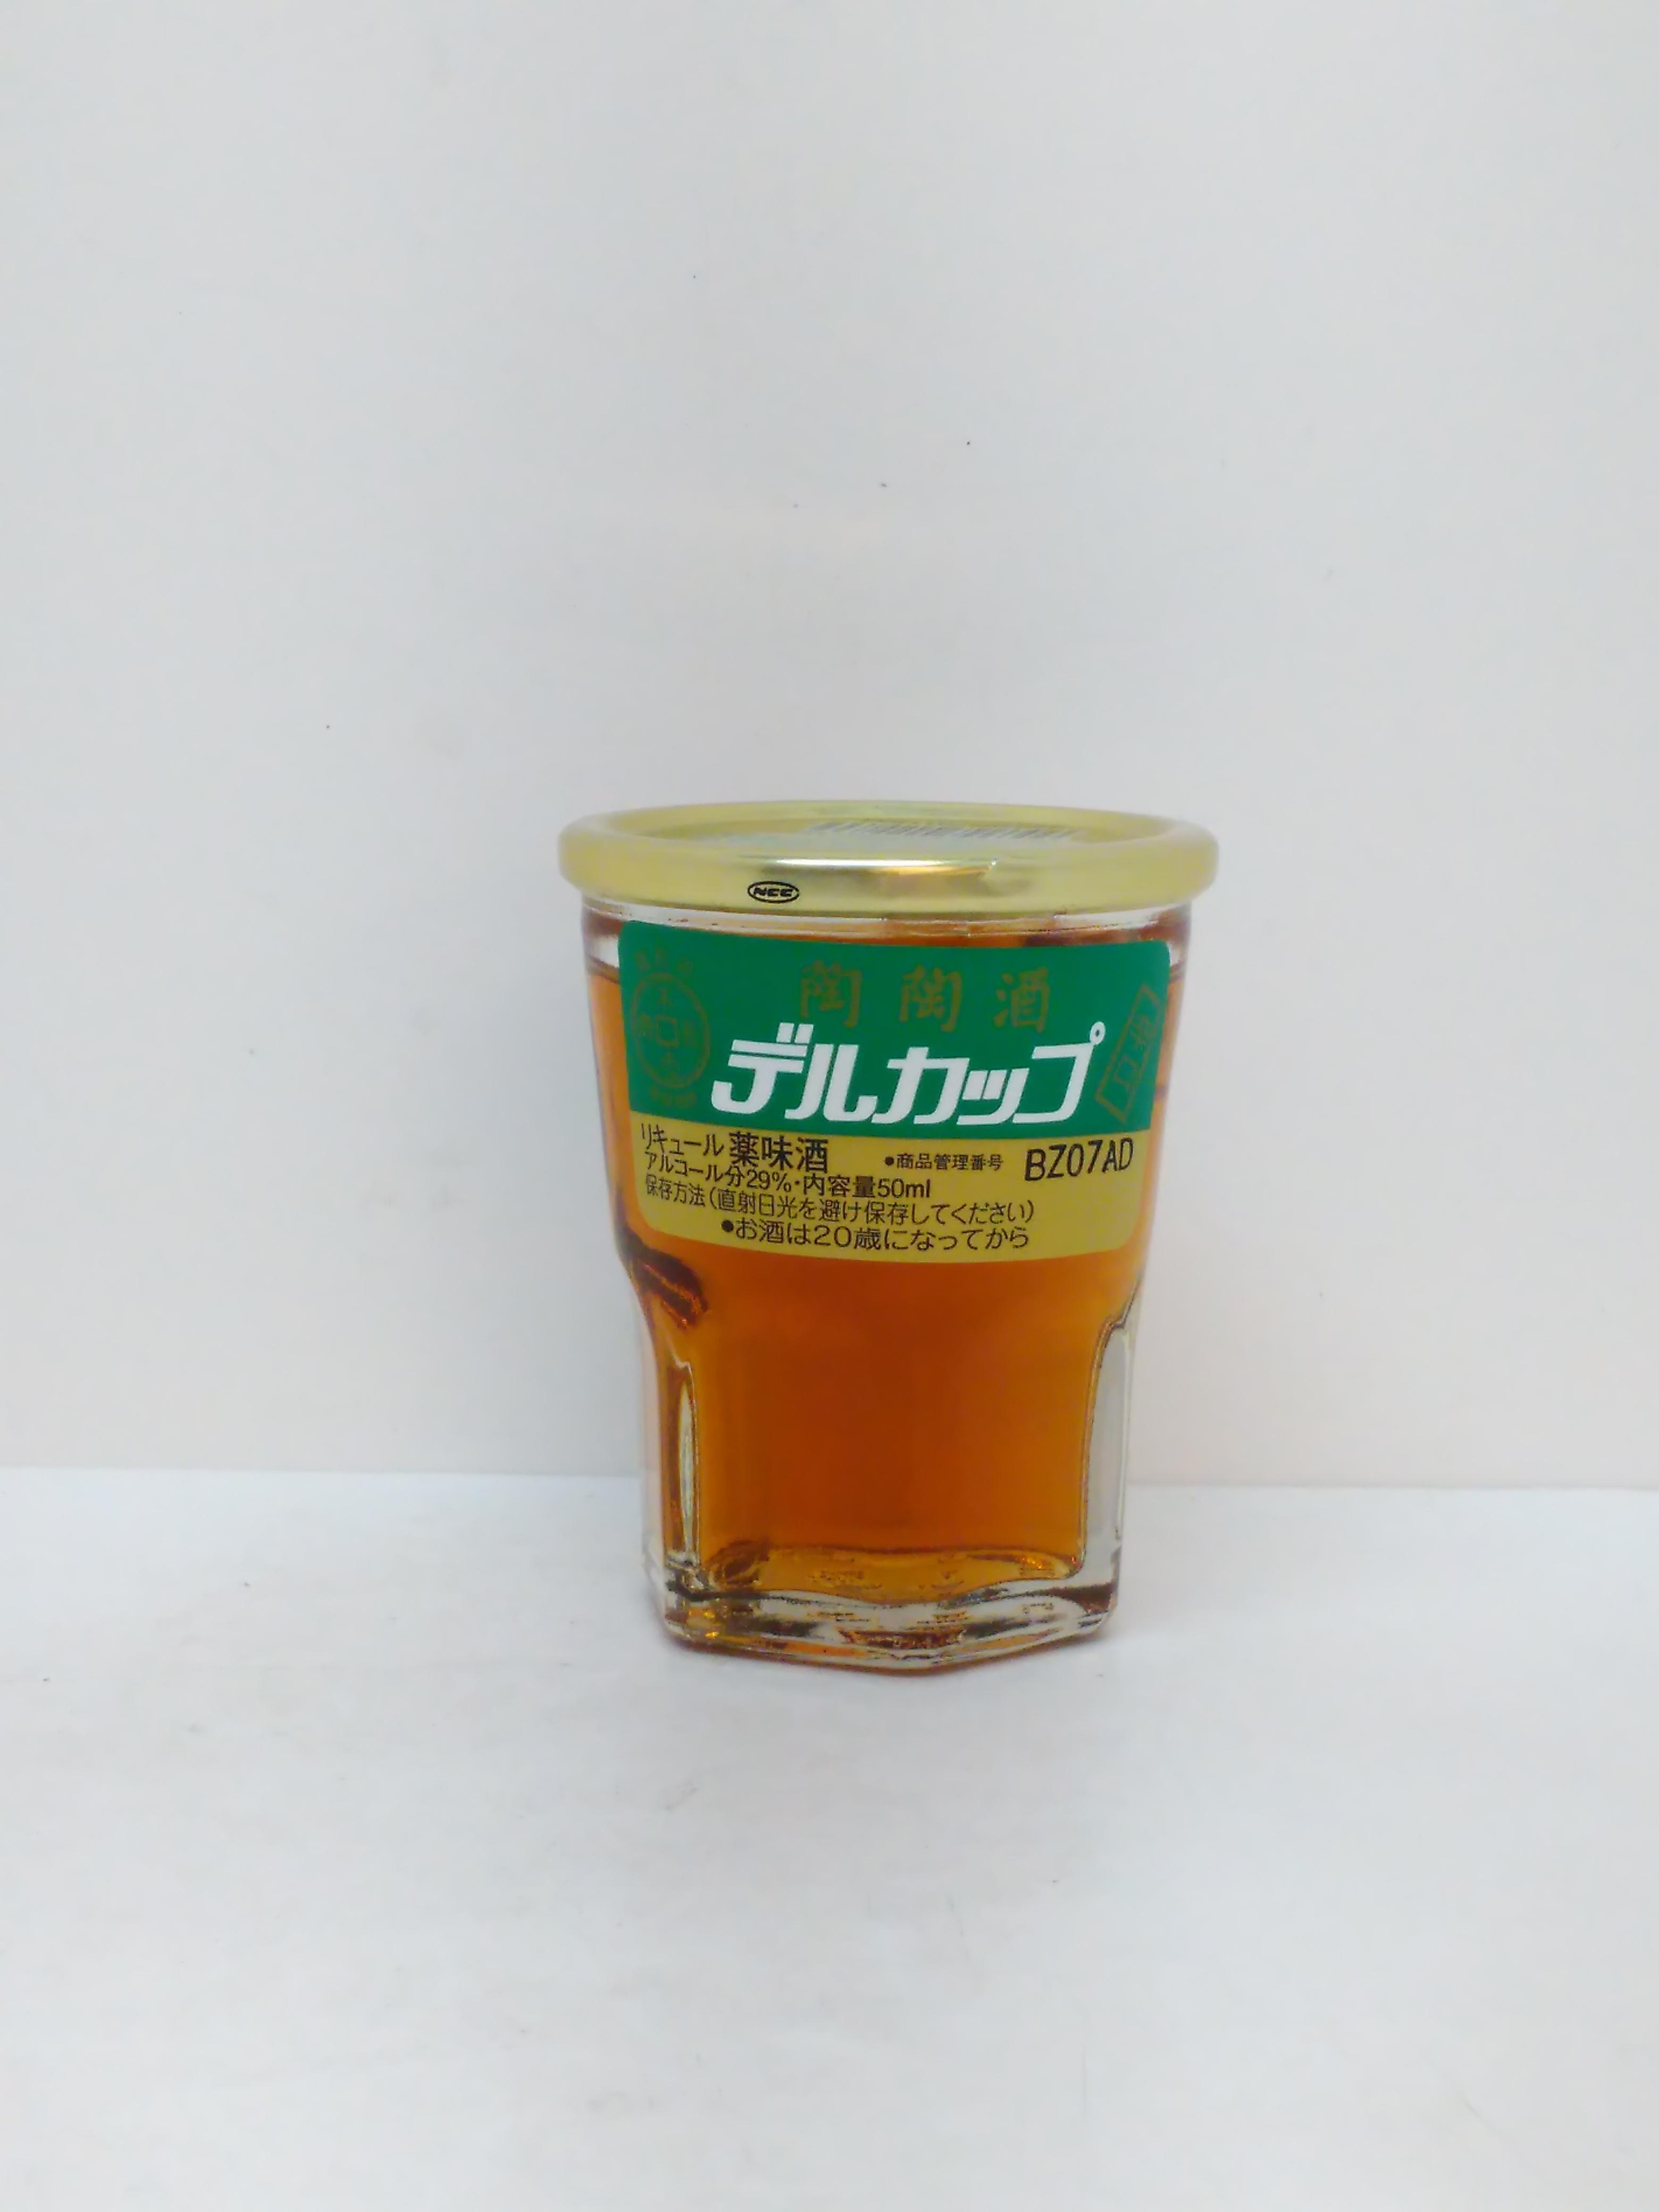 【TAKEYAスマイル便 対象品】陶陶酒 デルカップ 辛口 50ml